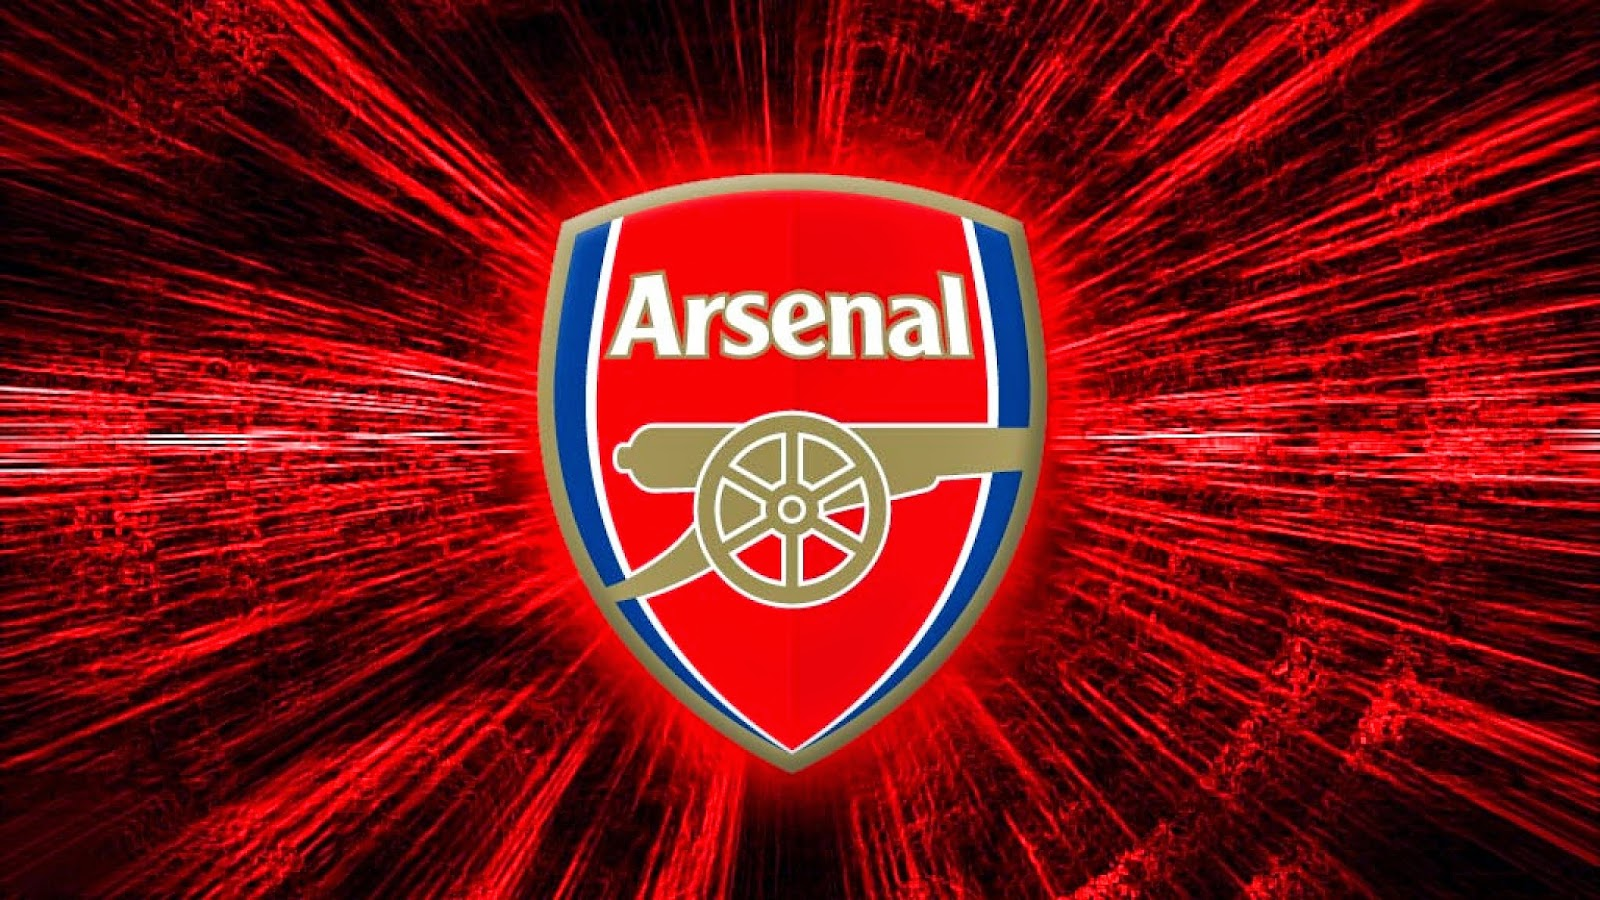 Arsenal Football Club Wallpaper Download Gambar Logo